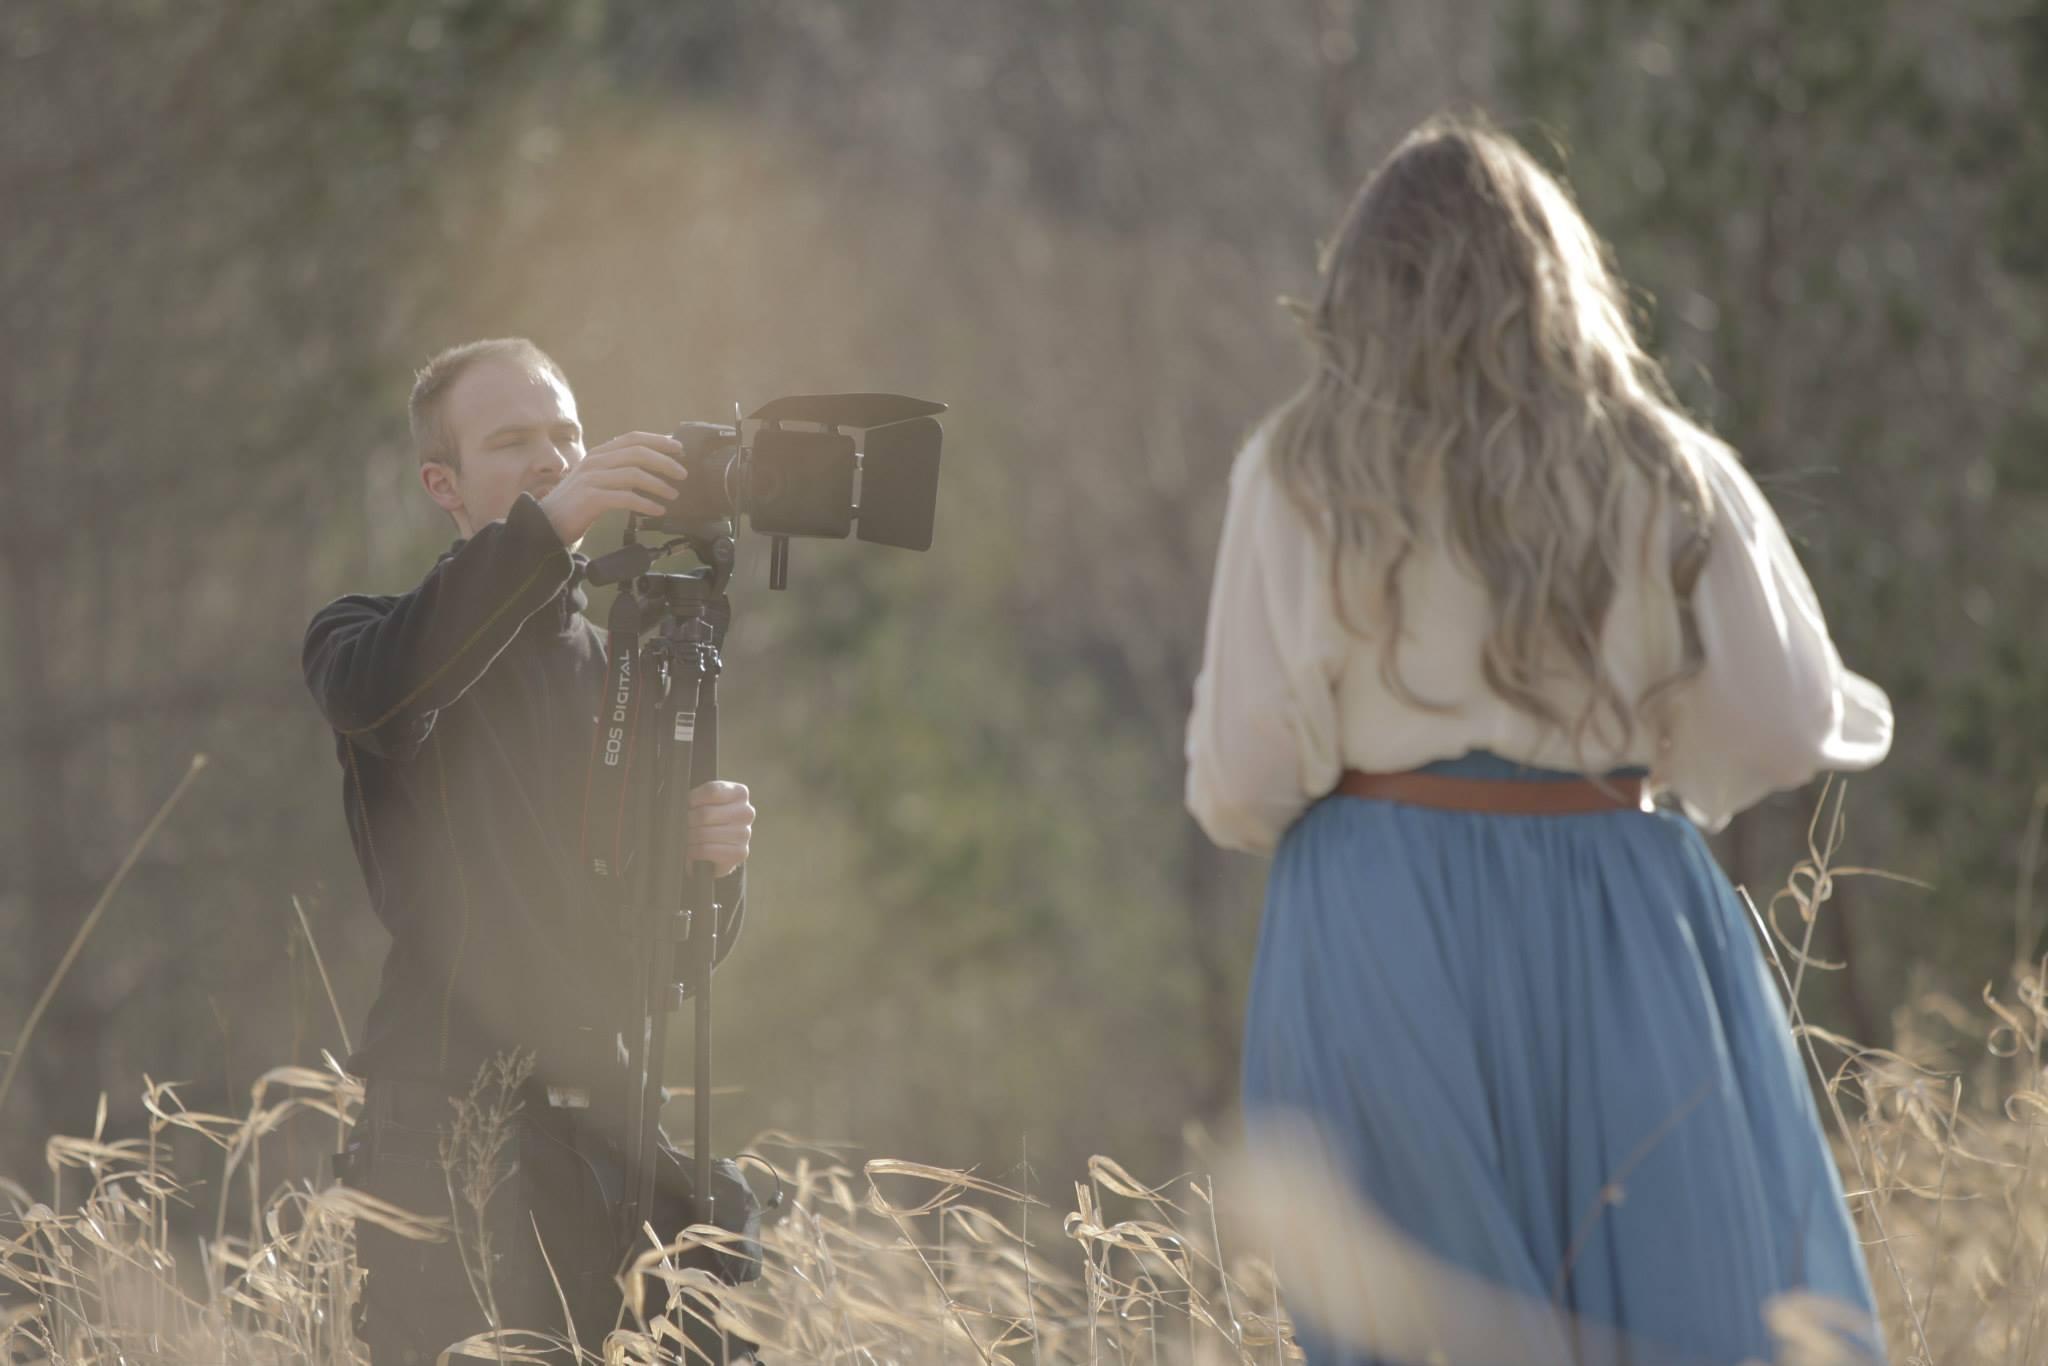 Portrett: Andreas Langvatn, Aalesund Smalfilmklubb